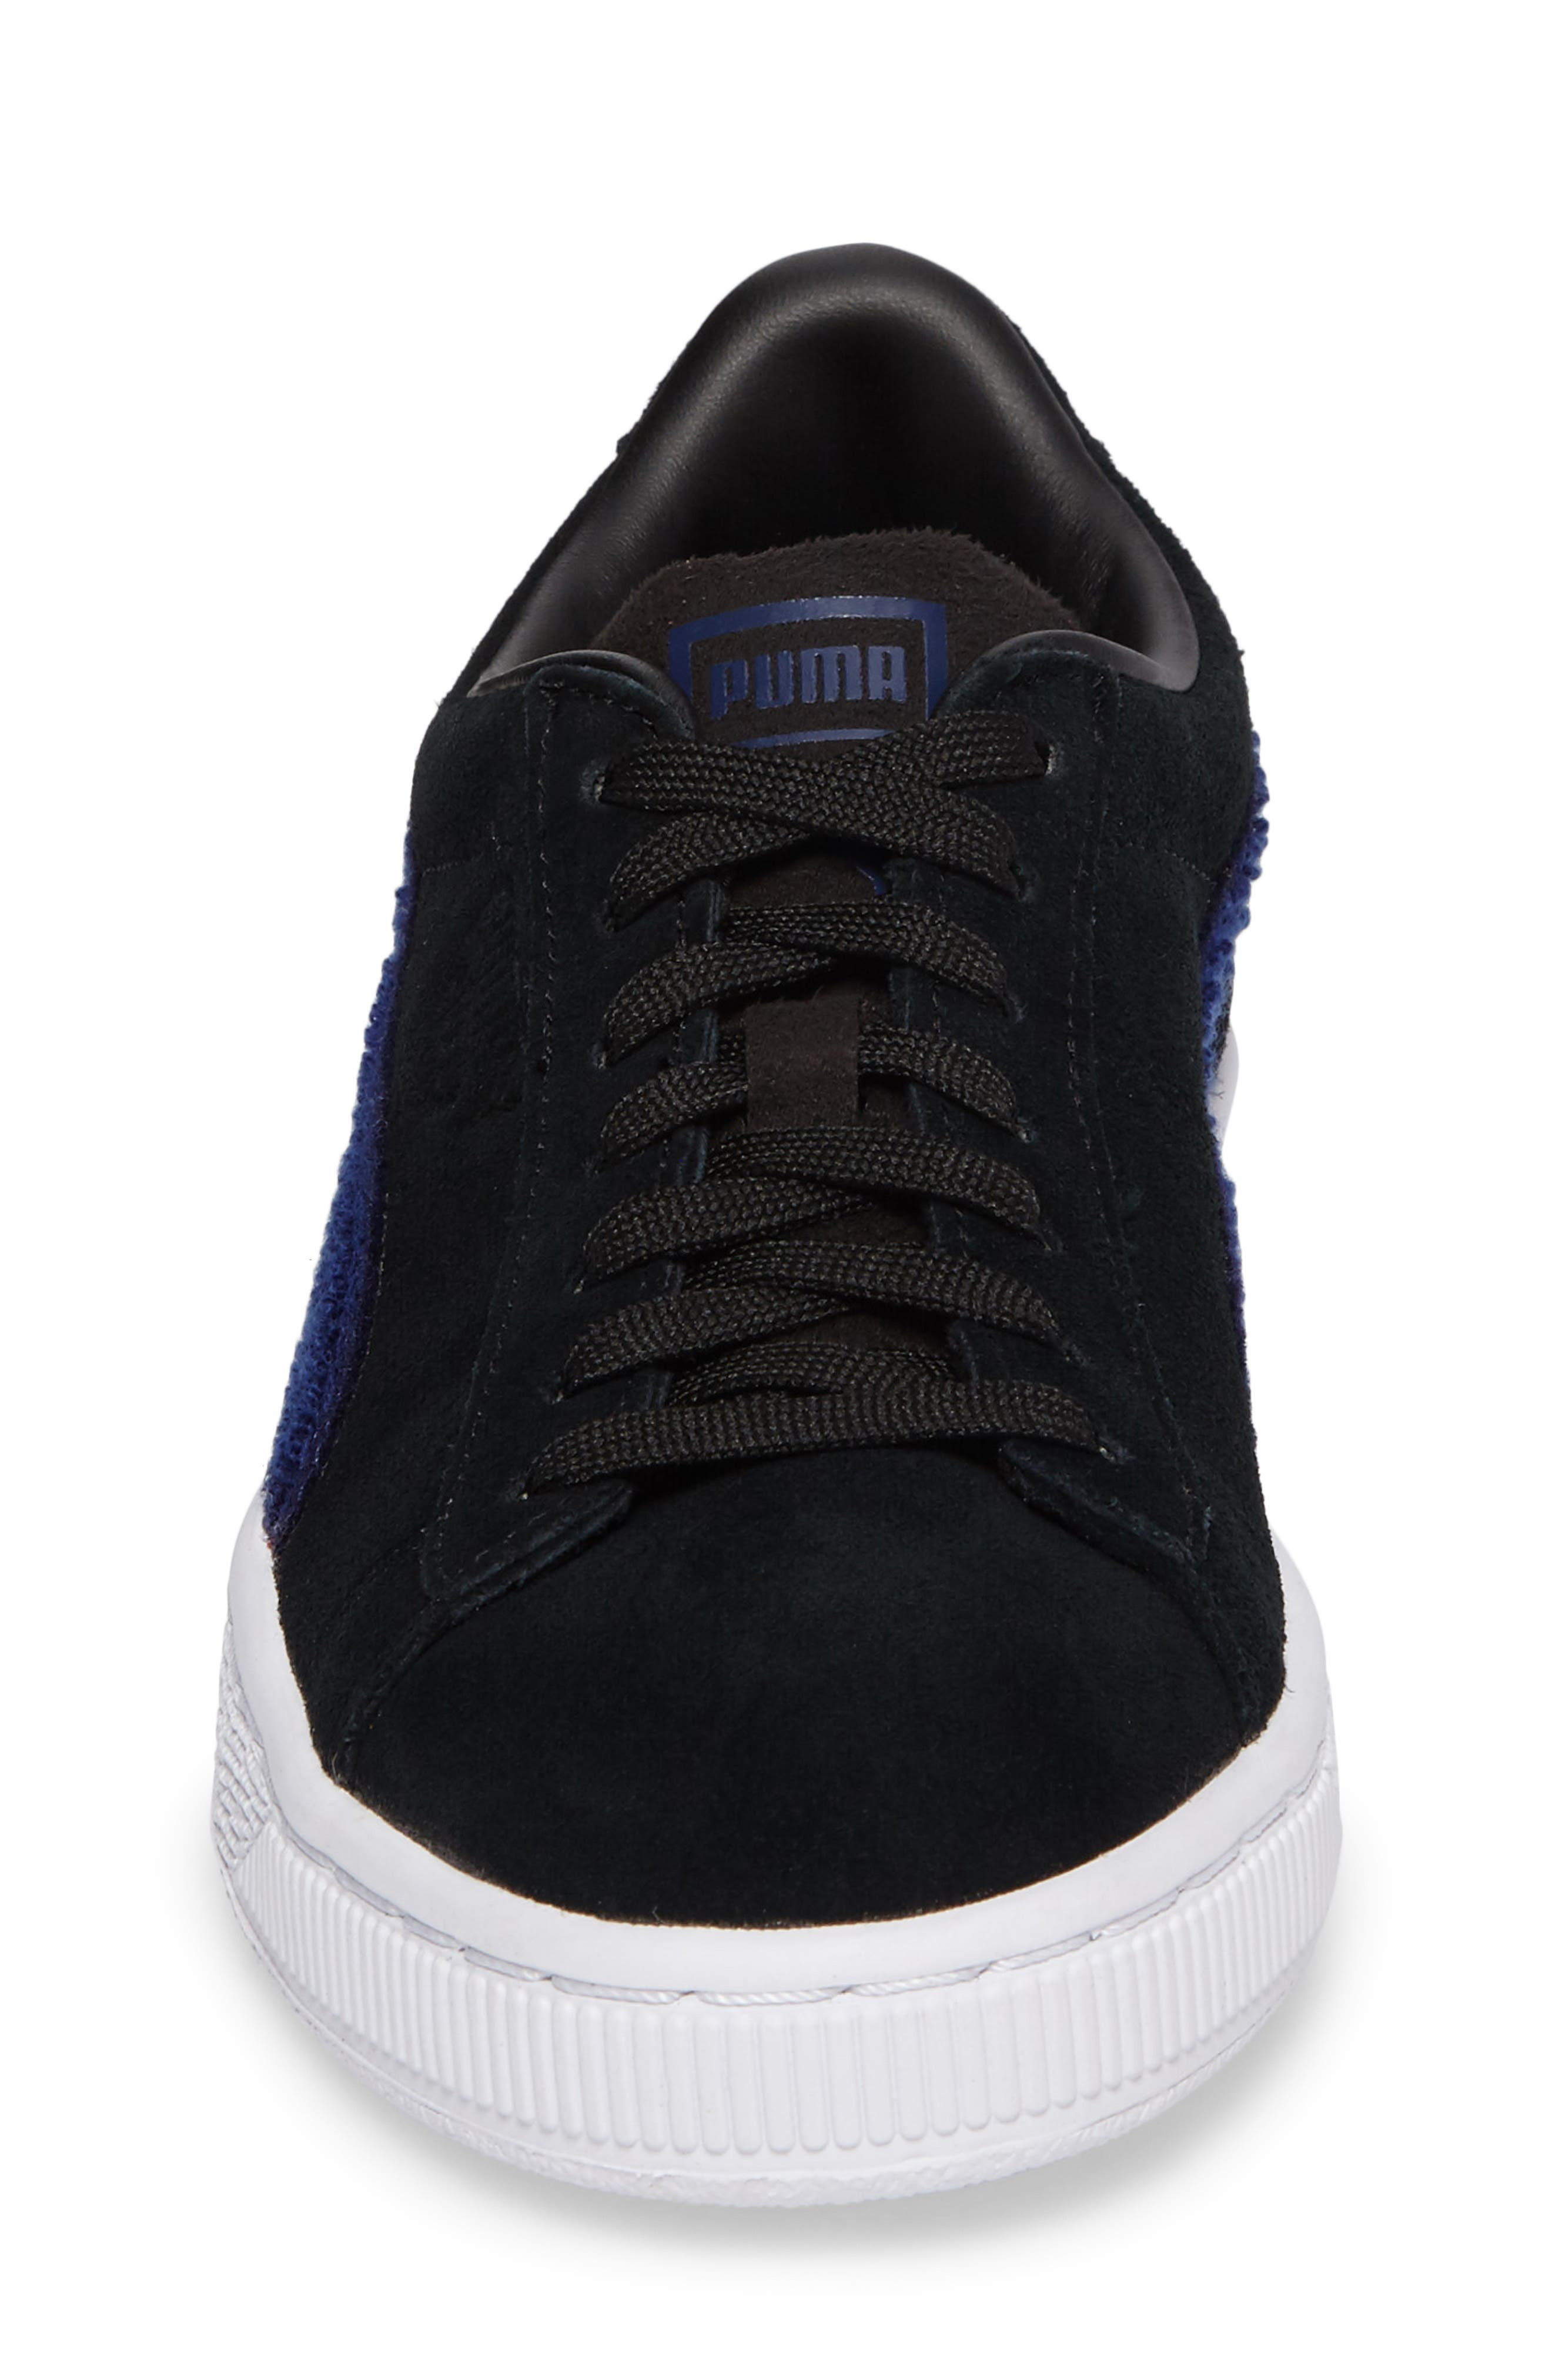 Classic Terry Jr Sneaker,                             Alternate thumbnail 4, color,                             Black